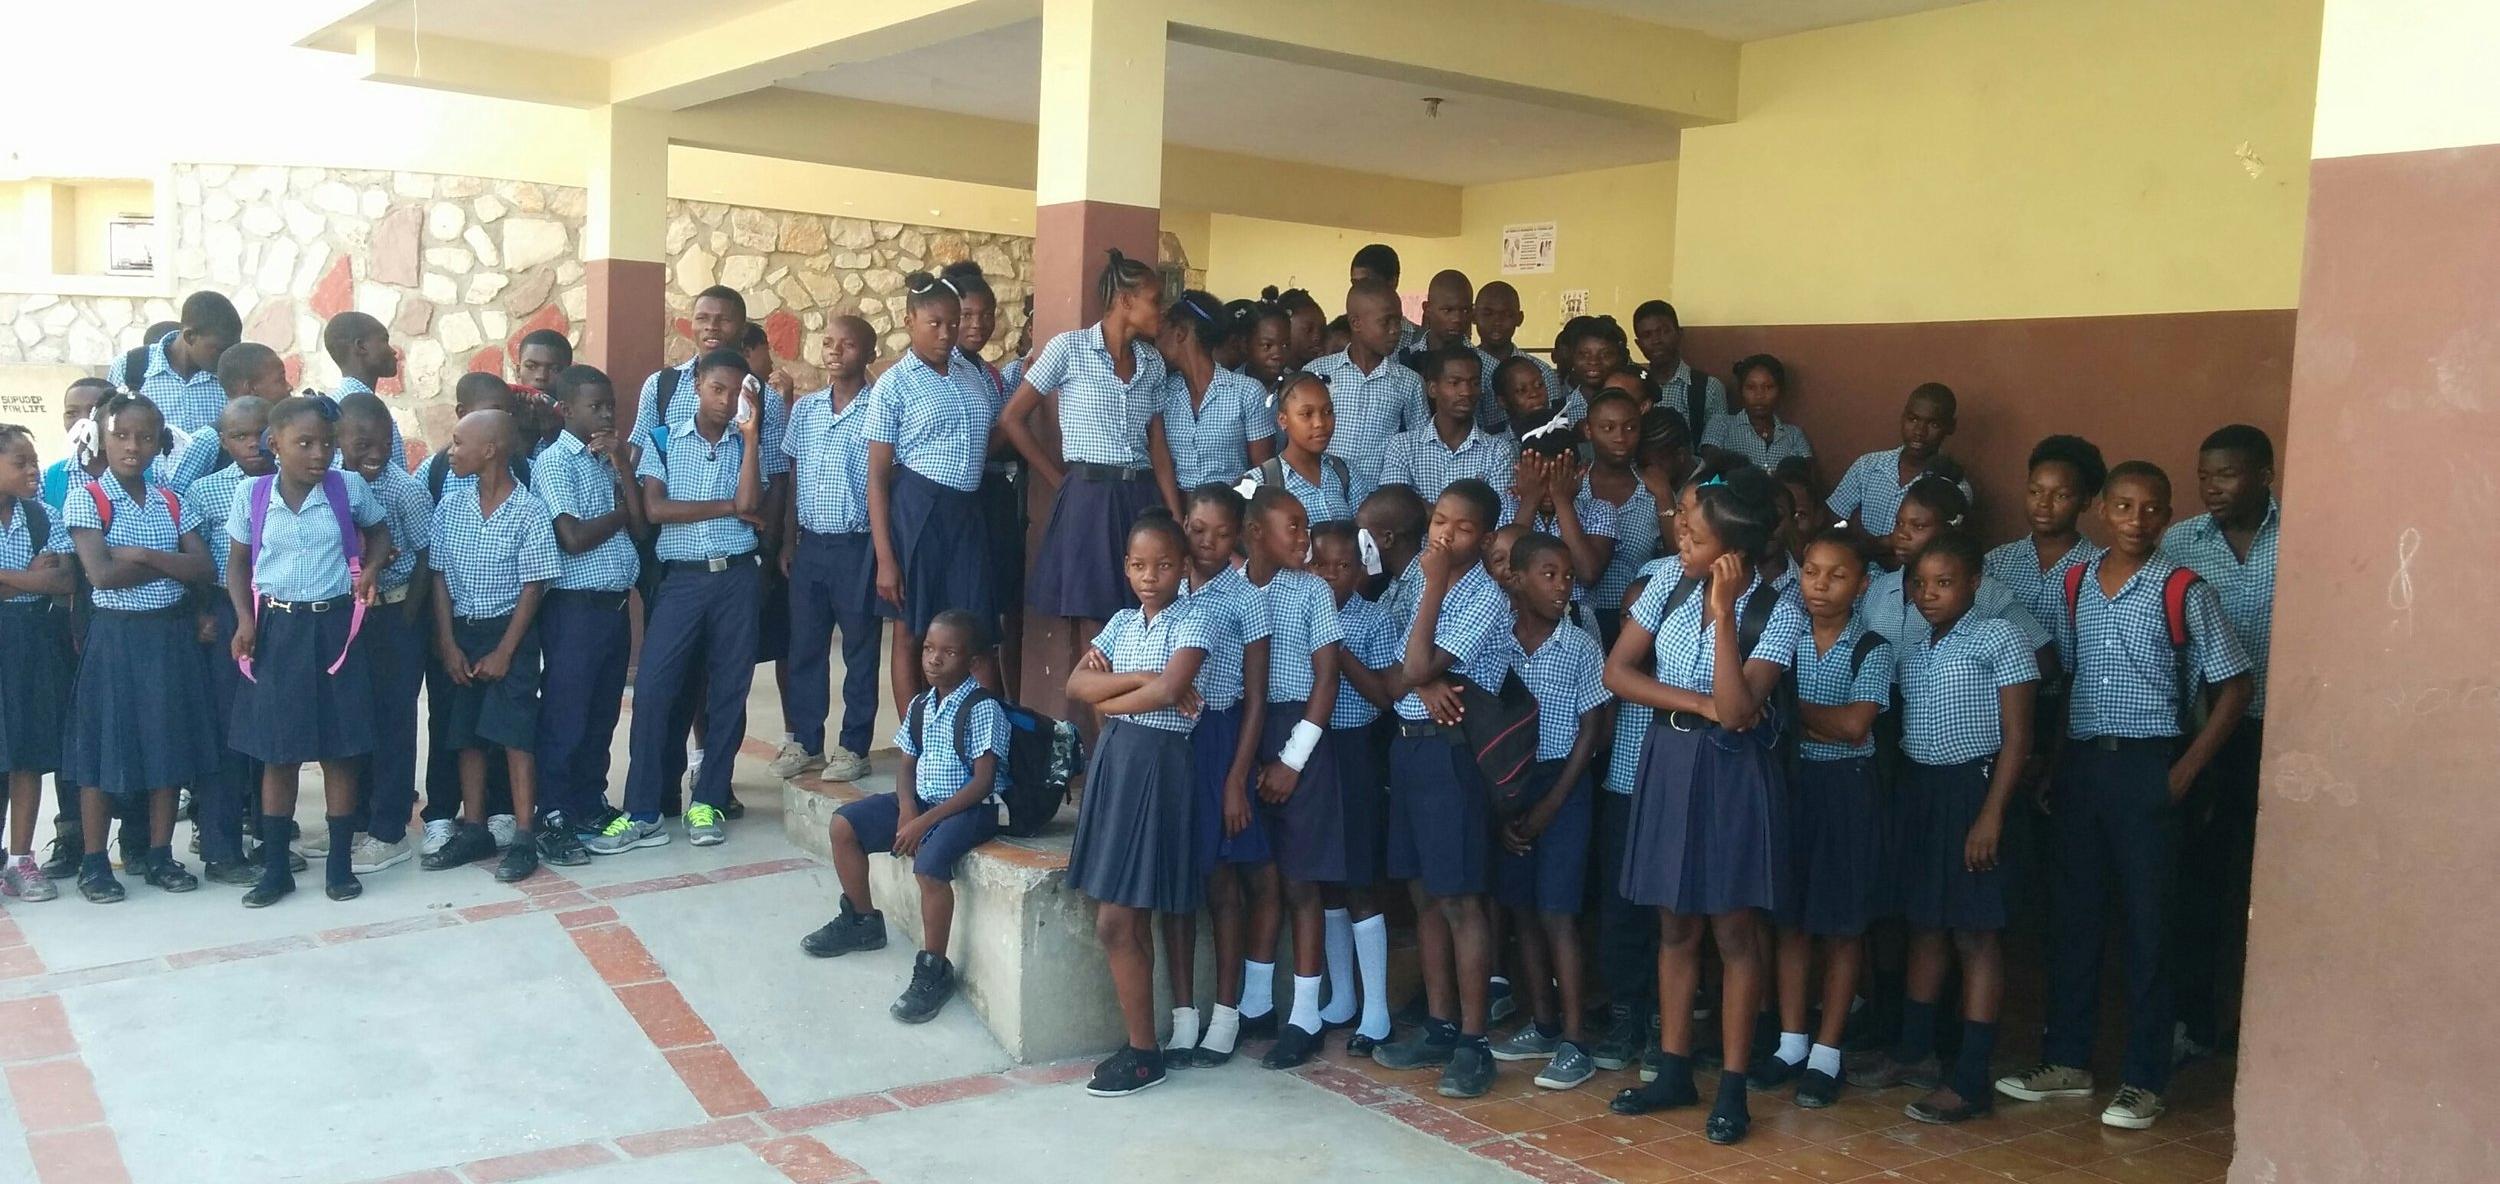 sopudep students in uniform